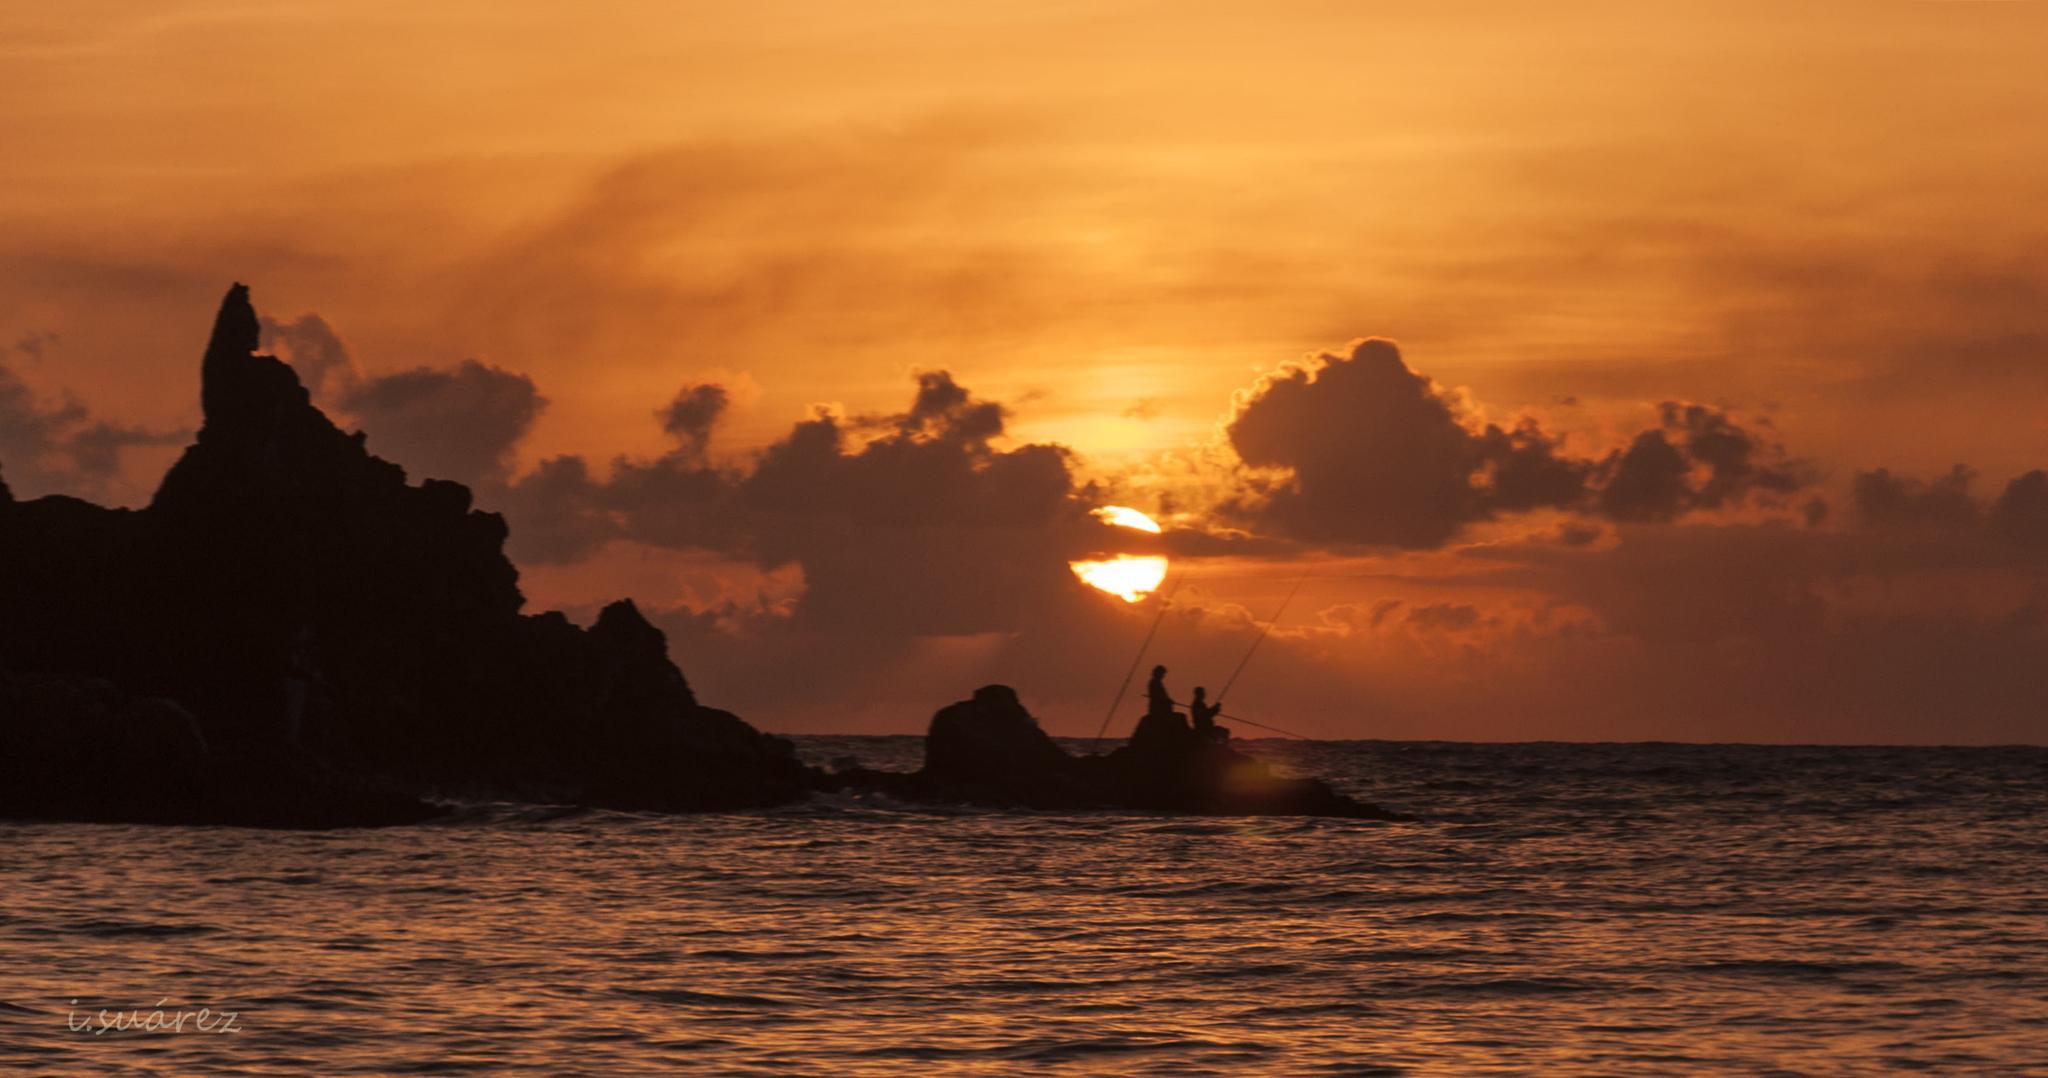 Sunrise (Gran Canaria) by inmaculadasuarezfleitas